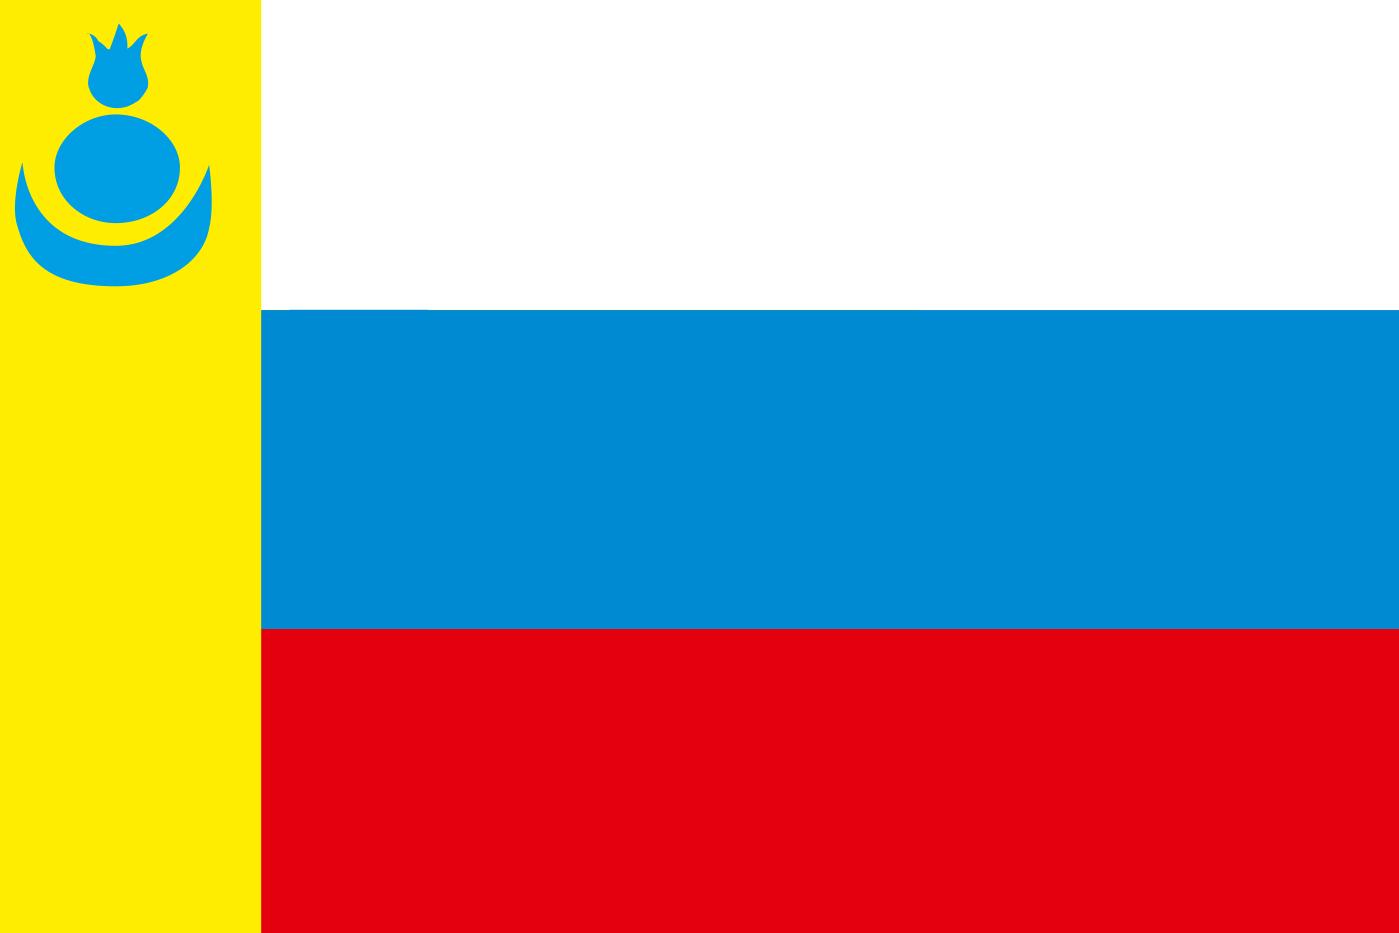 Флаг Агинского Бурятского округа 1996 года